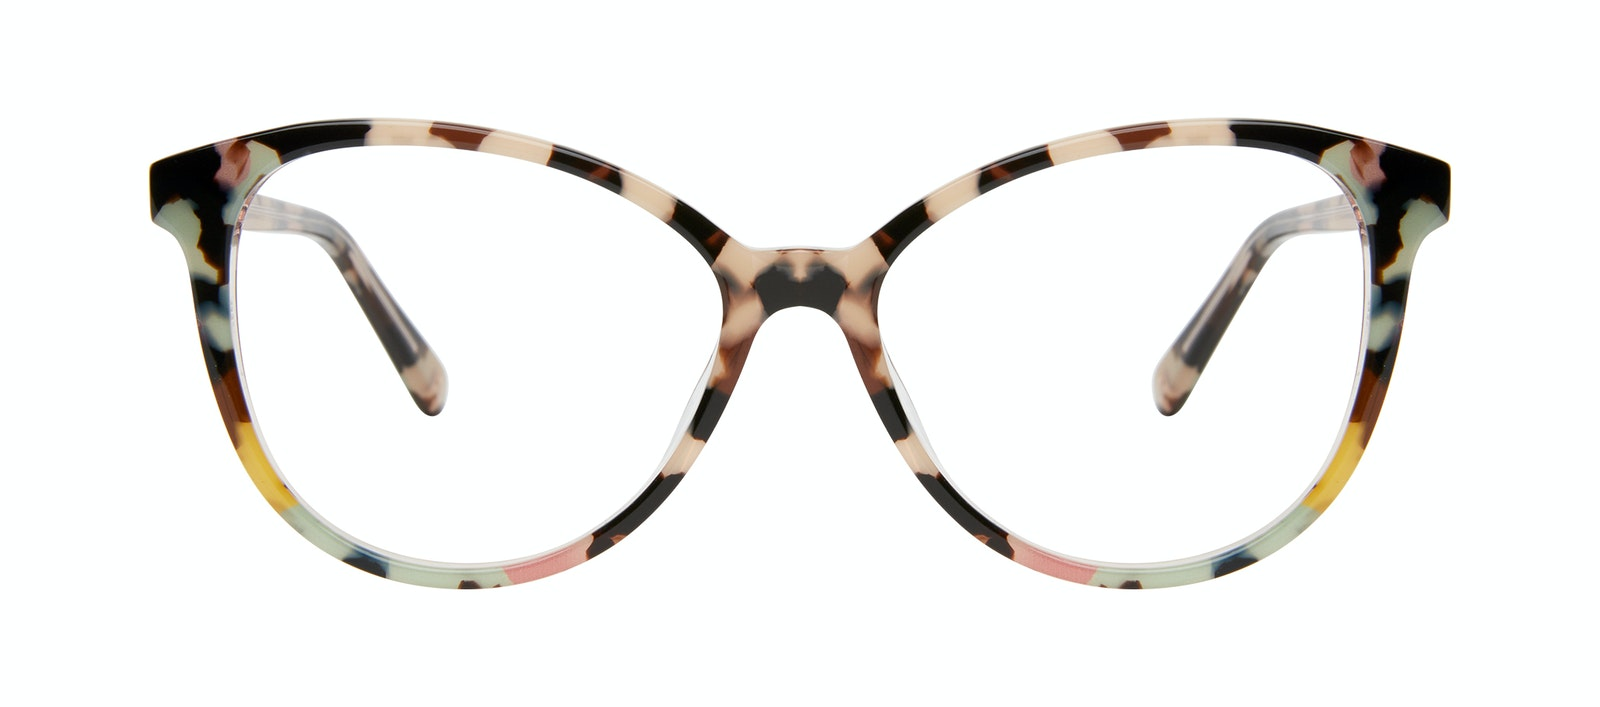 Affordable Fashion Glasses Cat Eye Eyeglasses Women Esprit L Pastel Tort Front